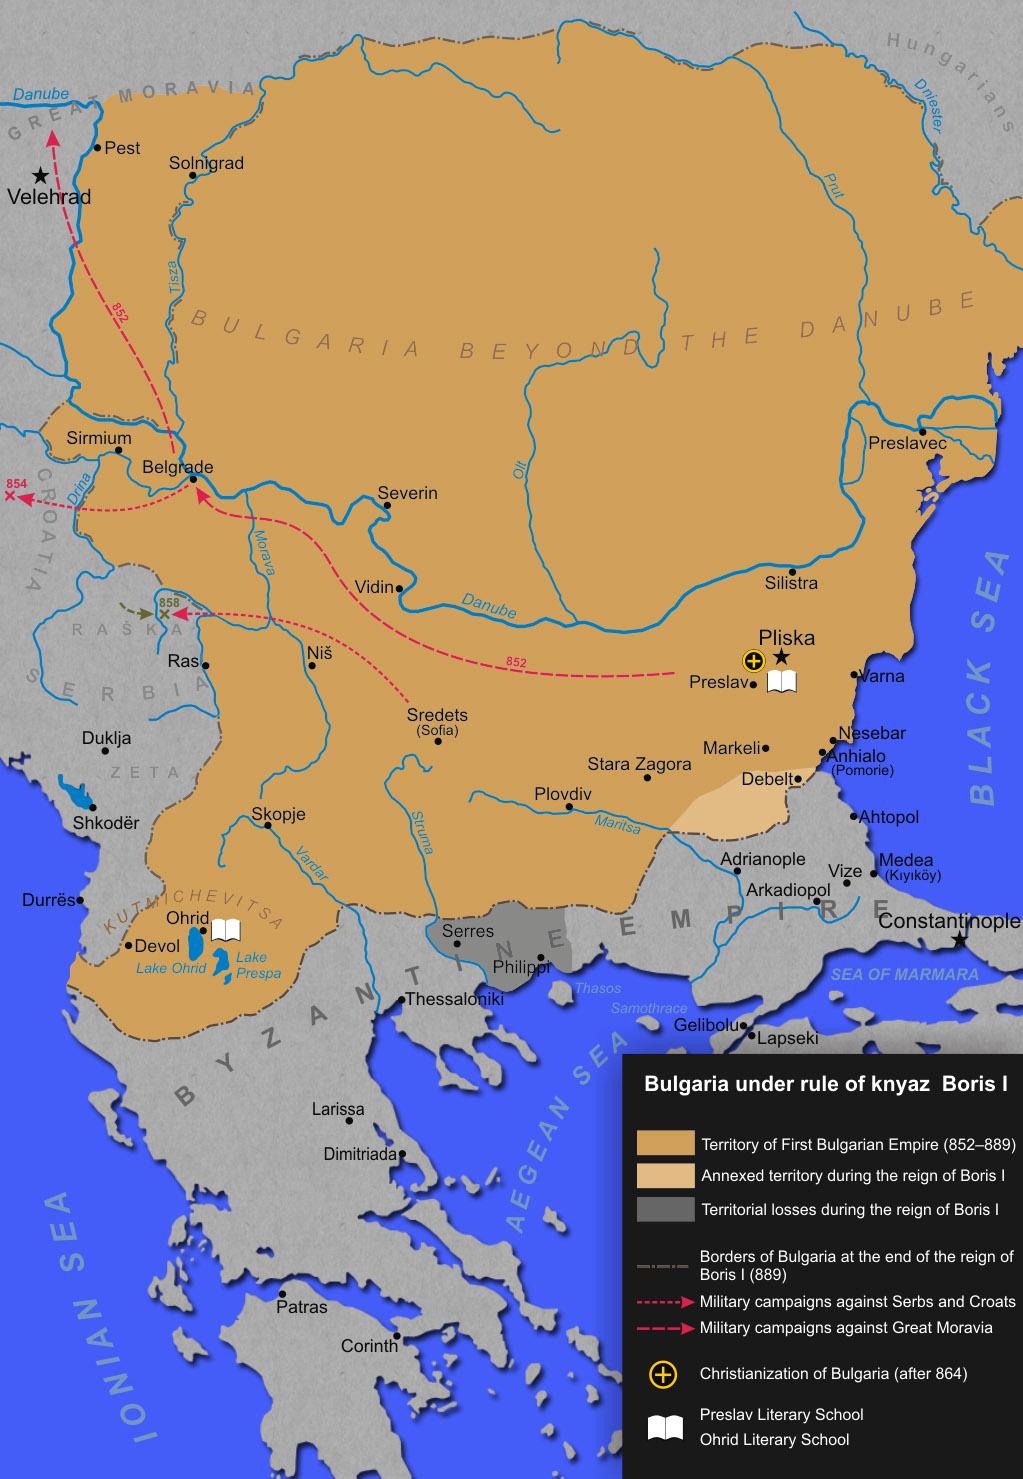 Bulgaria_under_rule_of_Boris_I-st-the-baptizer-king-of-Bulgaria